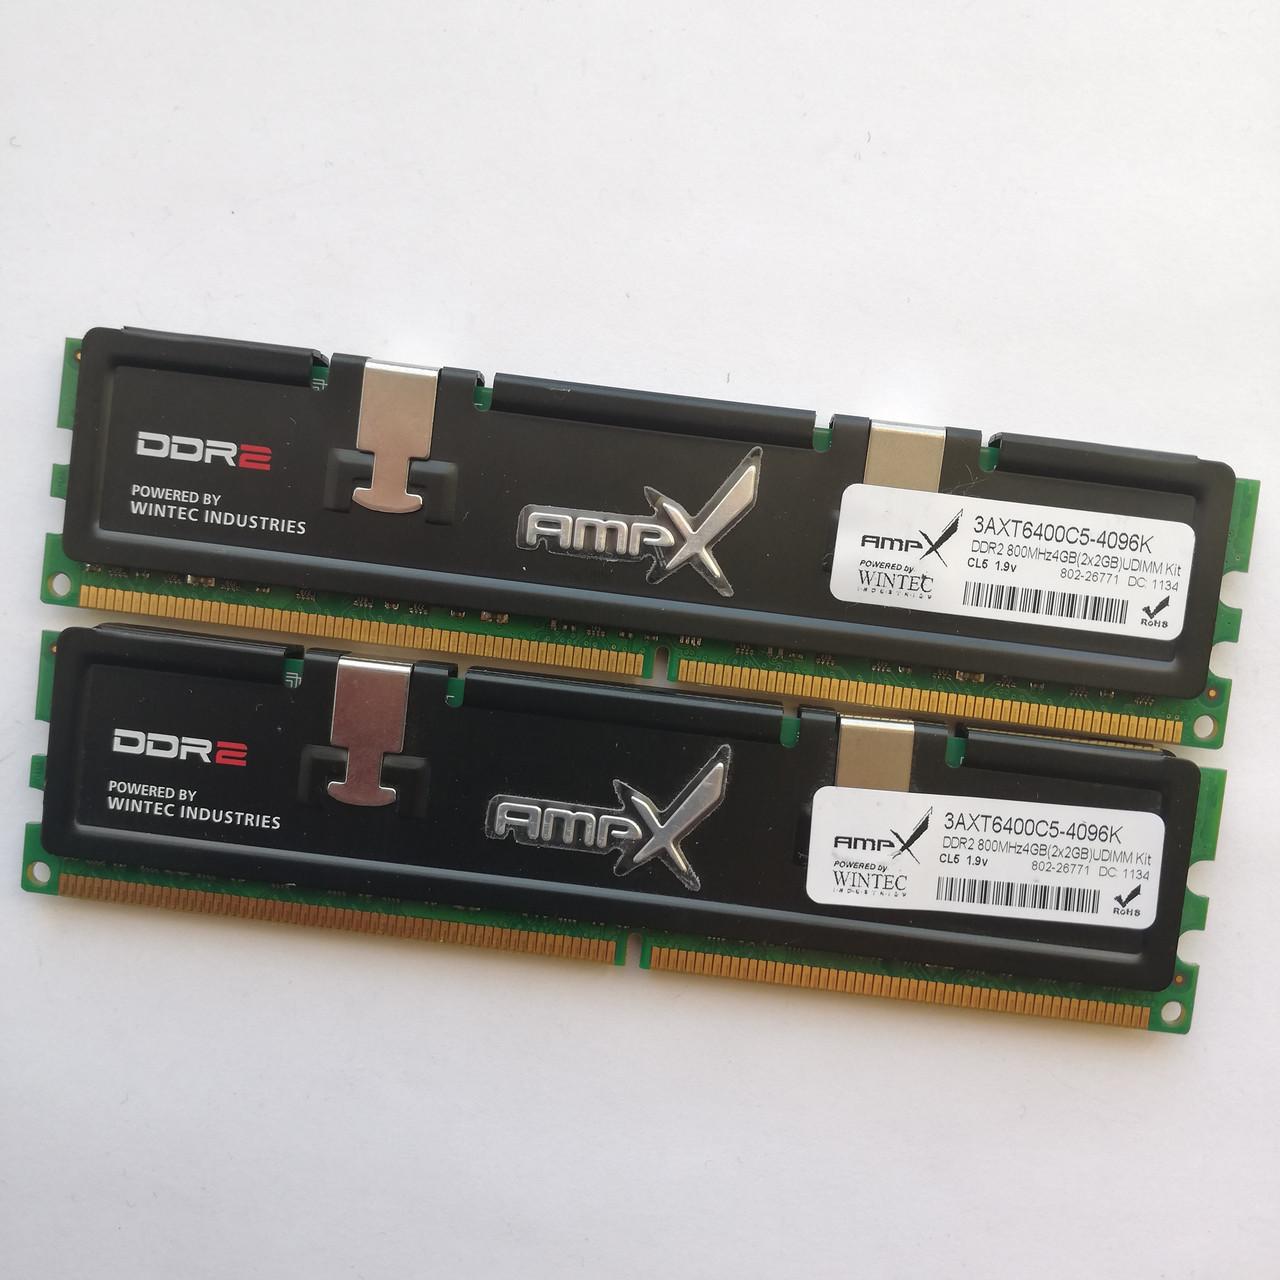 Комплект оперативной памяти Wintec DDR2 4Gb KIT of 2 800MHz PC2 6400U CL5 (3AXT6400C5-4096K) Б/У